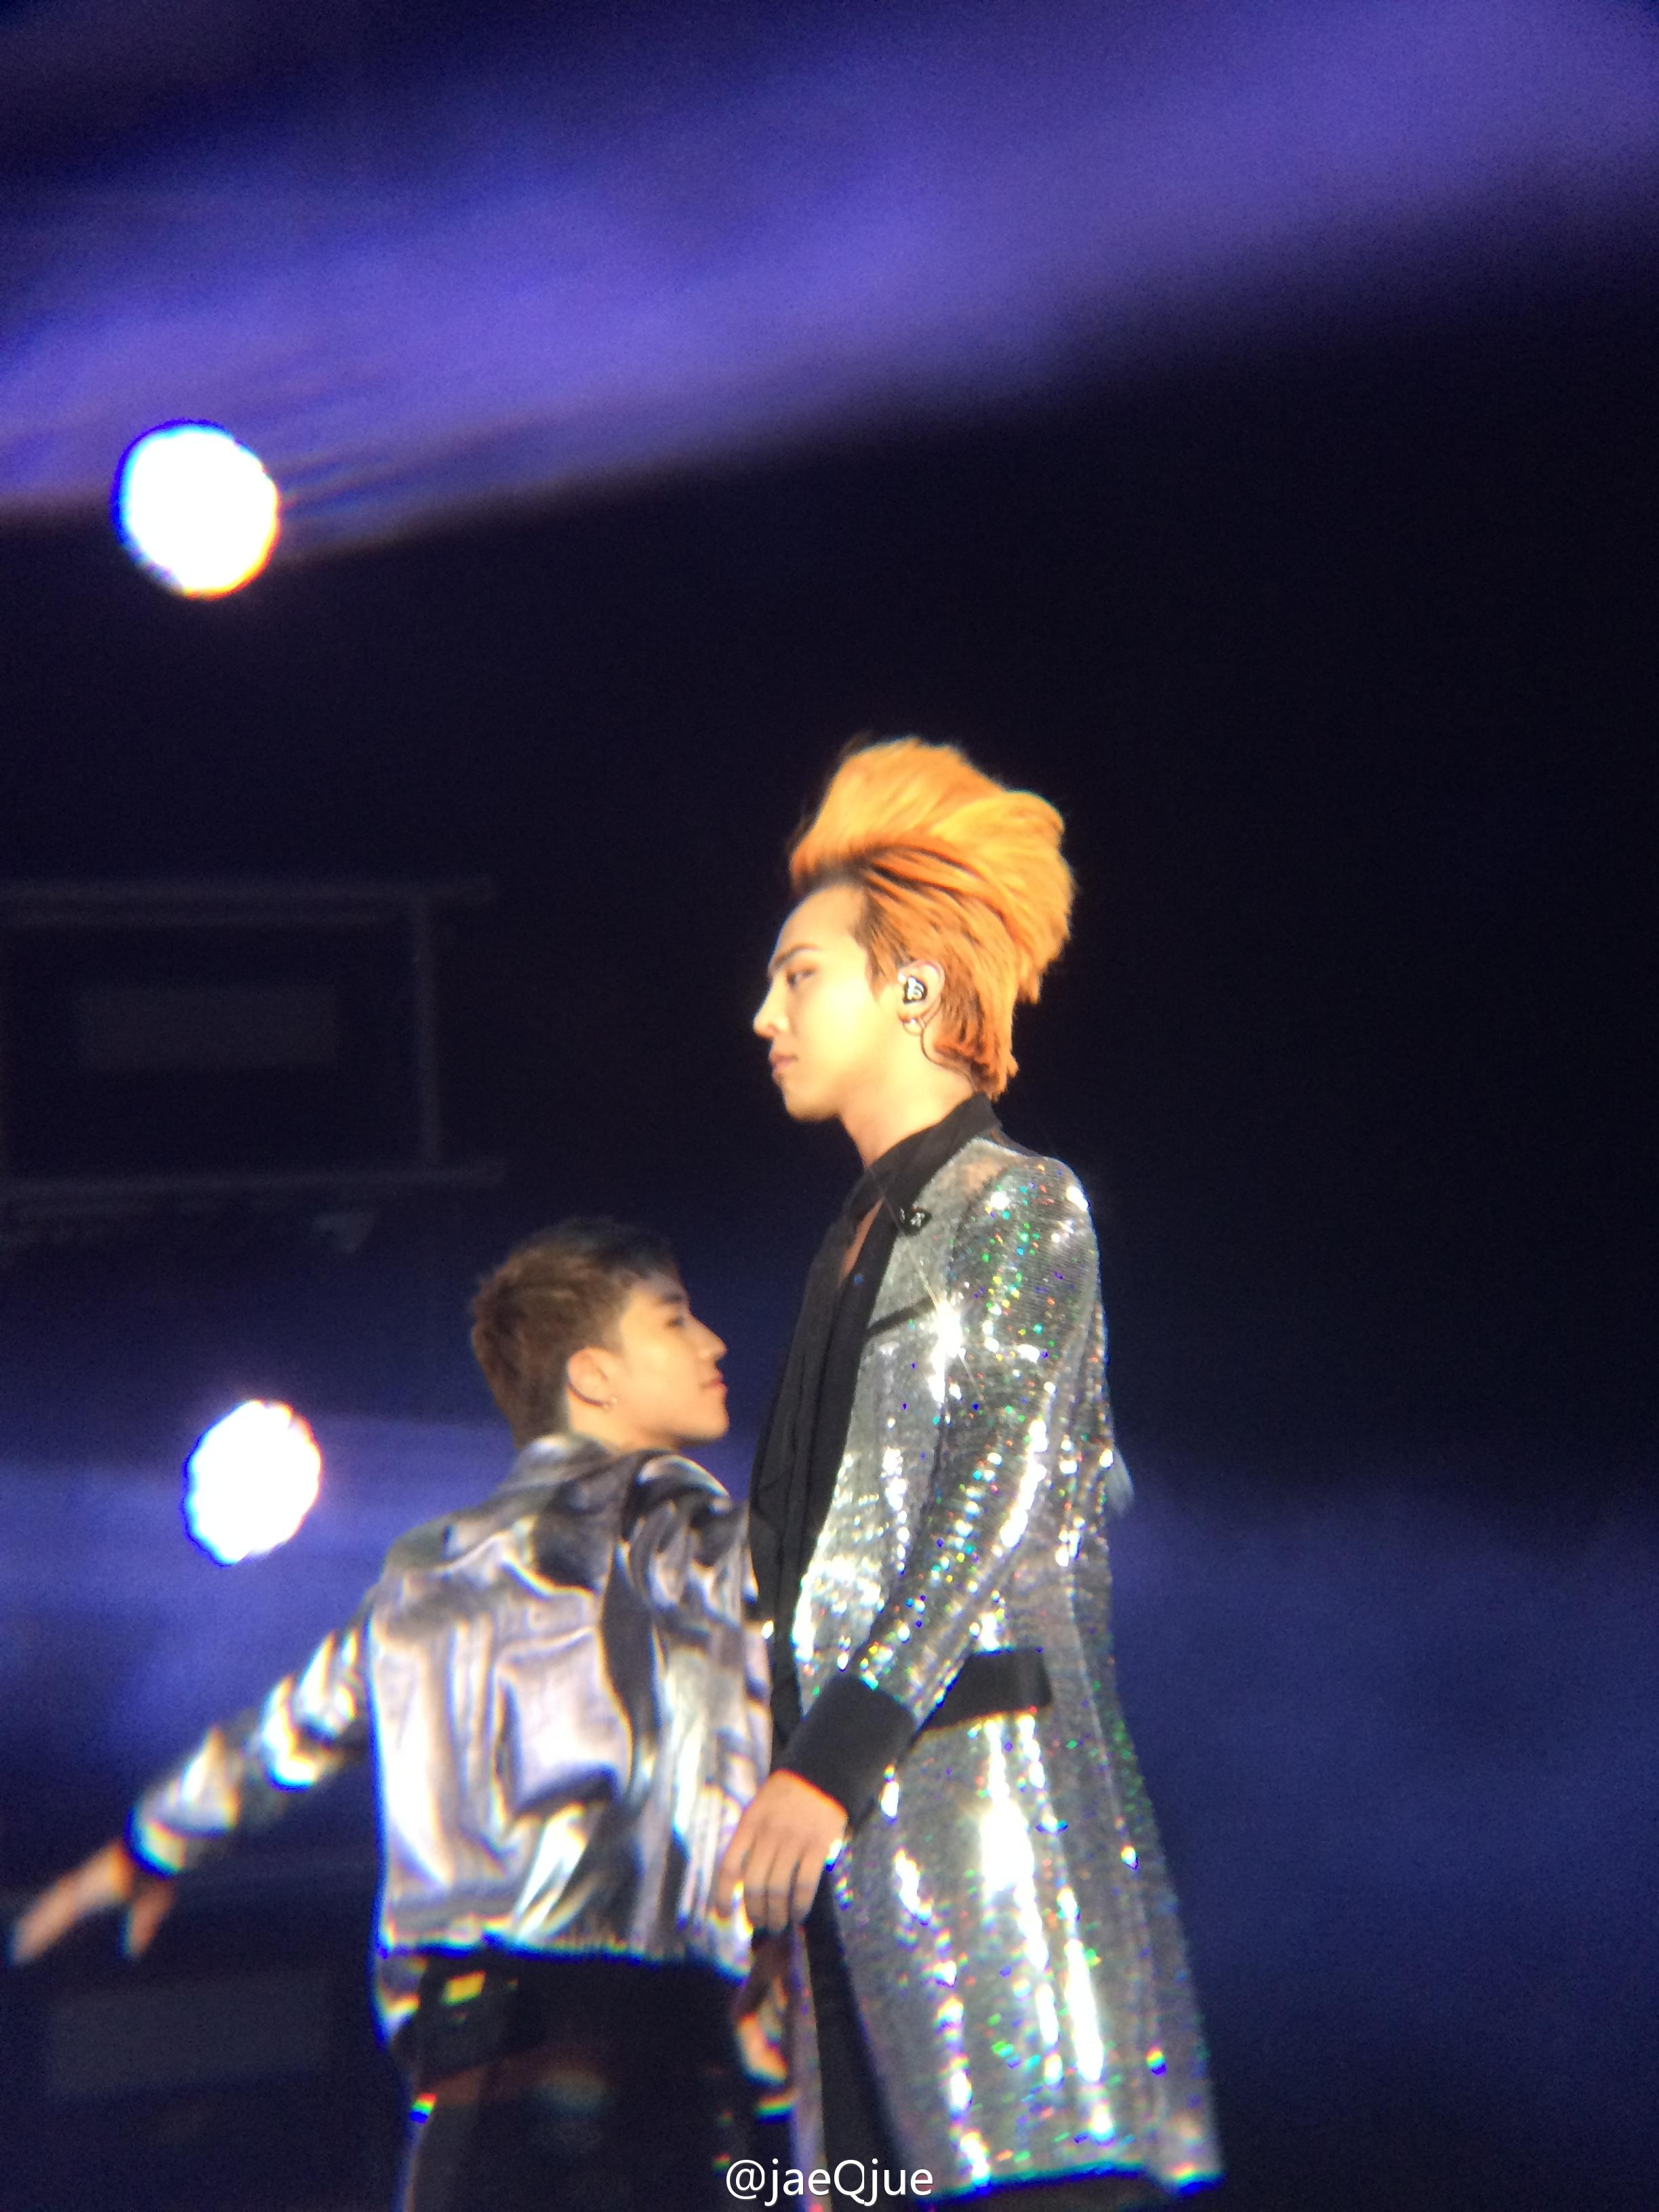 BIGBANG - Made Tour 2015 - Hangzhou - 25aug2015 - jaeQjue - 01.jpg